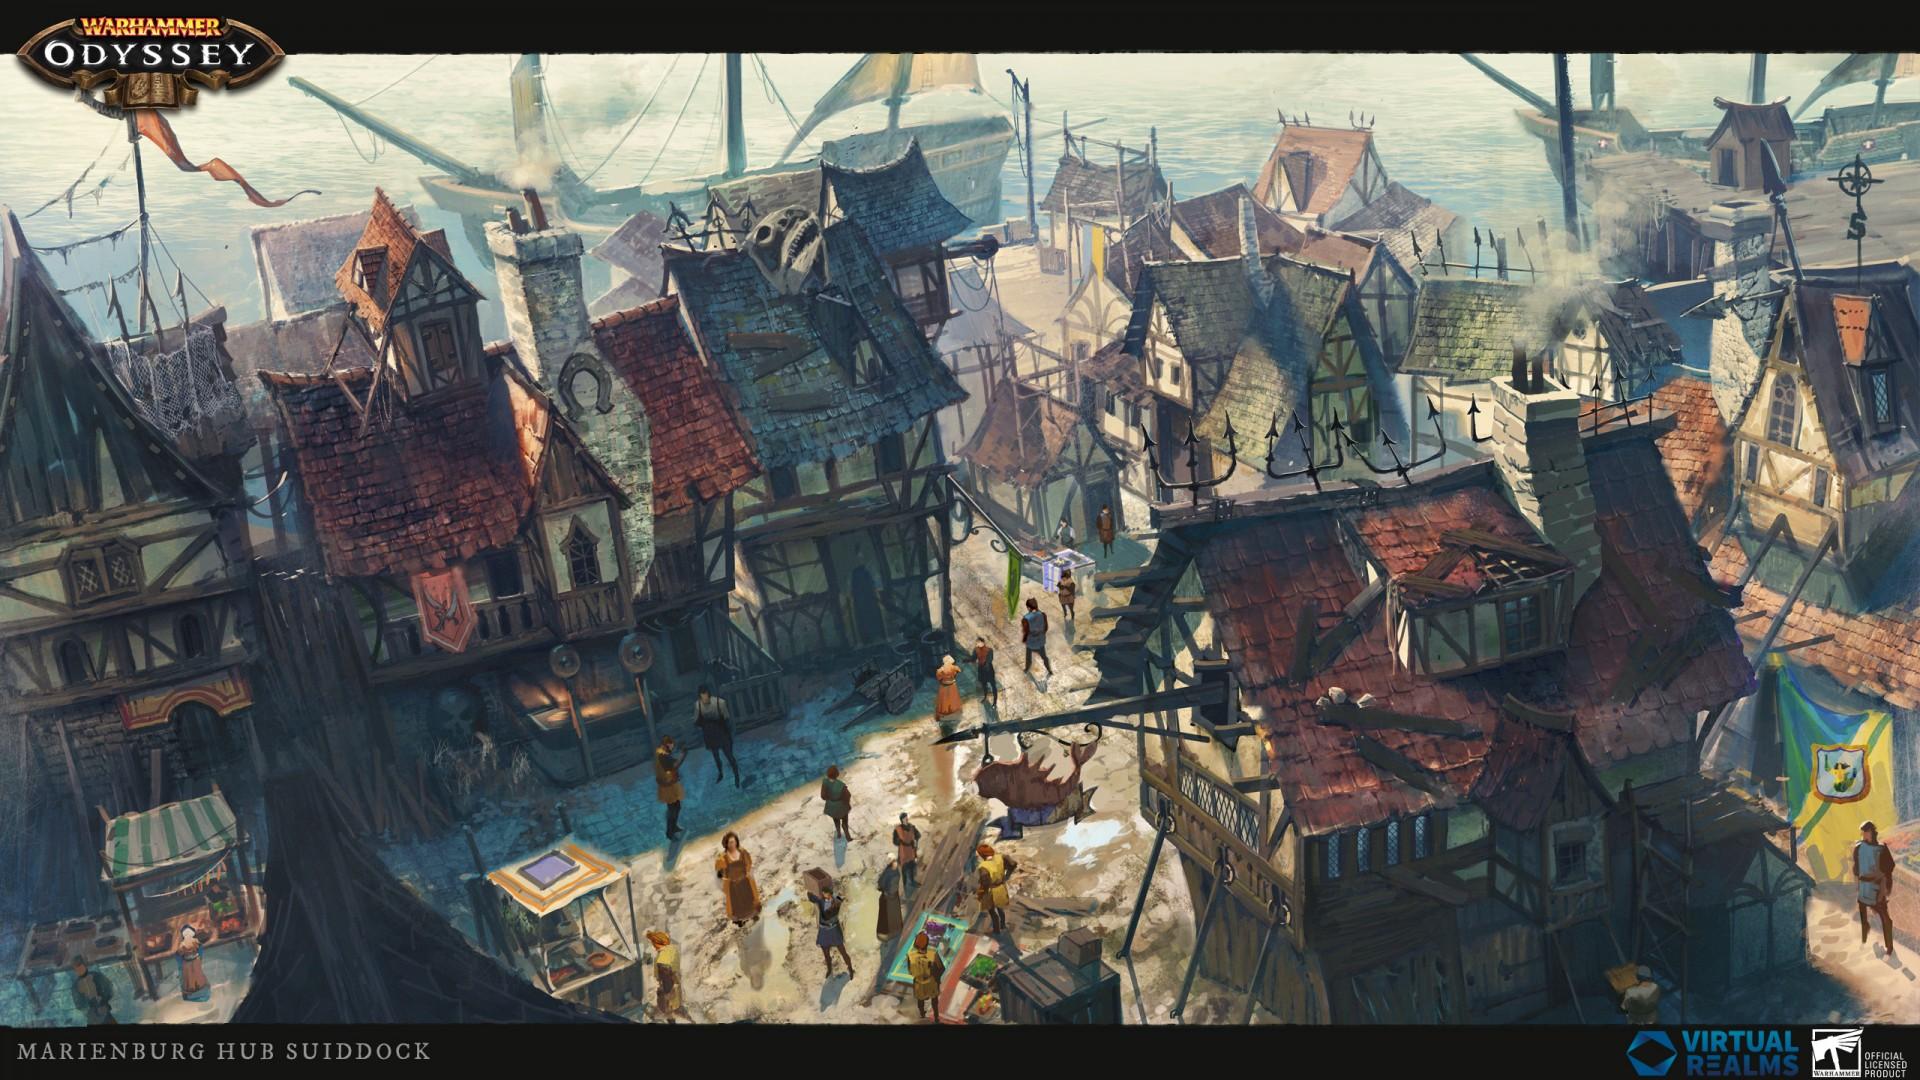 В ролёвке Warhammer: Odyssey показали Мариенбург